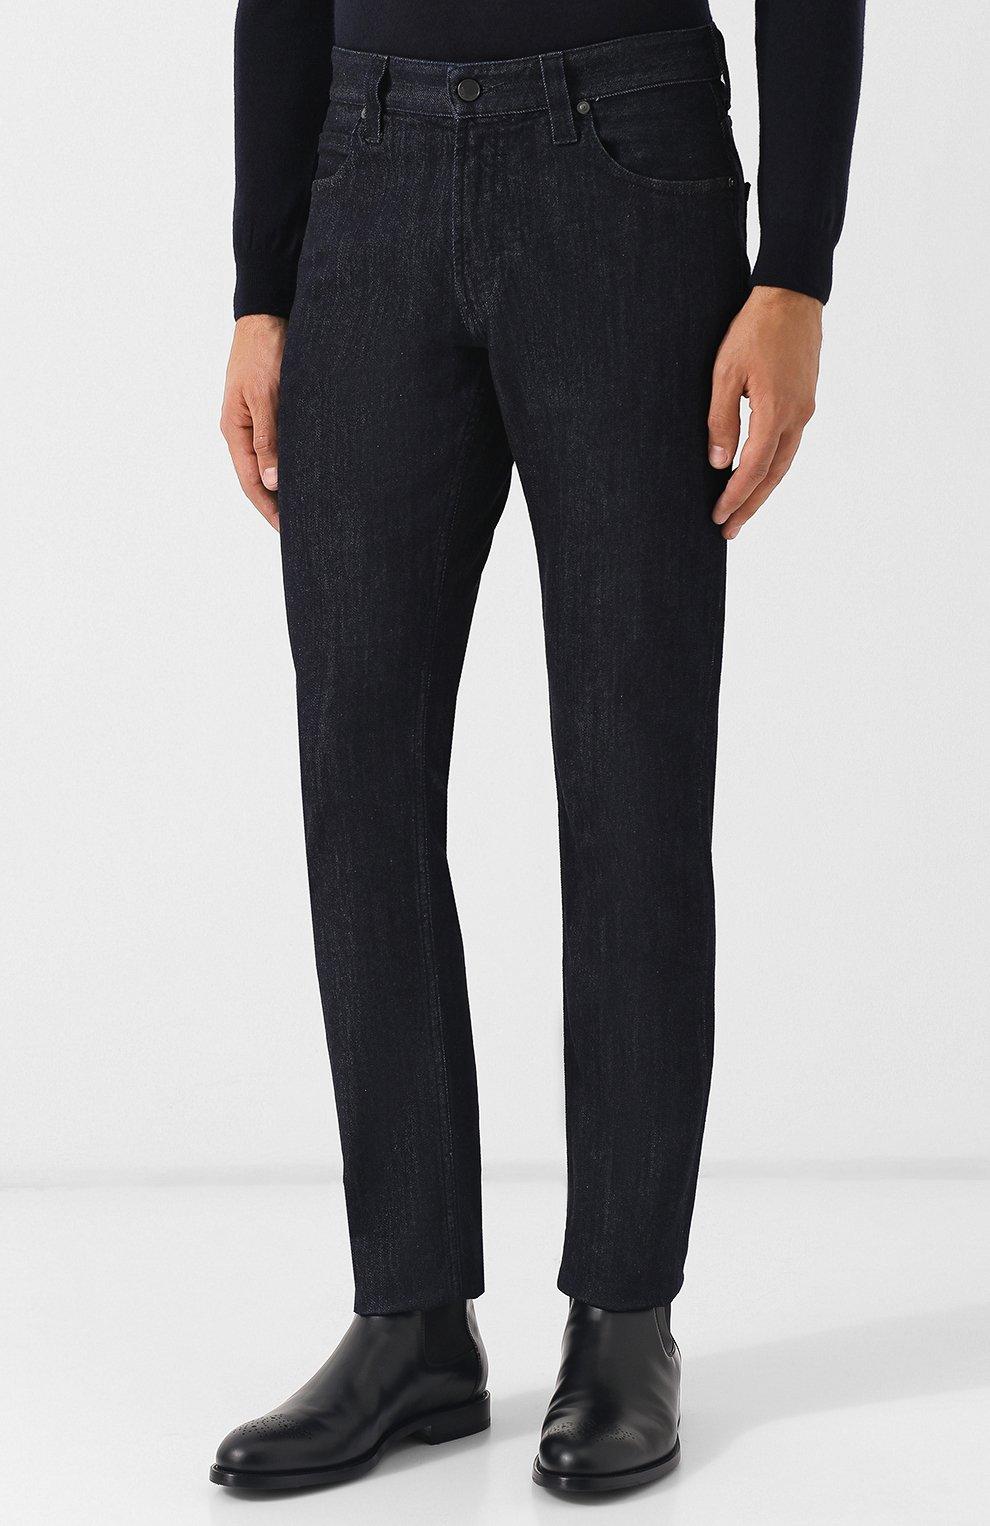 Мужские джинсы прямого кроя GIORGIO ARMANI синего цвета, арт. 6ZSJ15/SD30Z   Фото 3